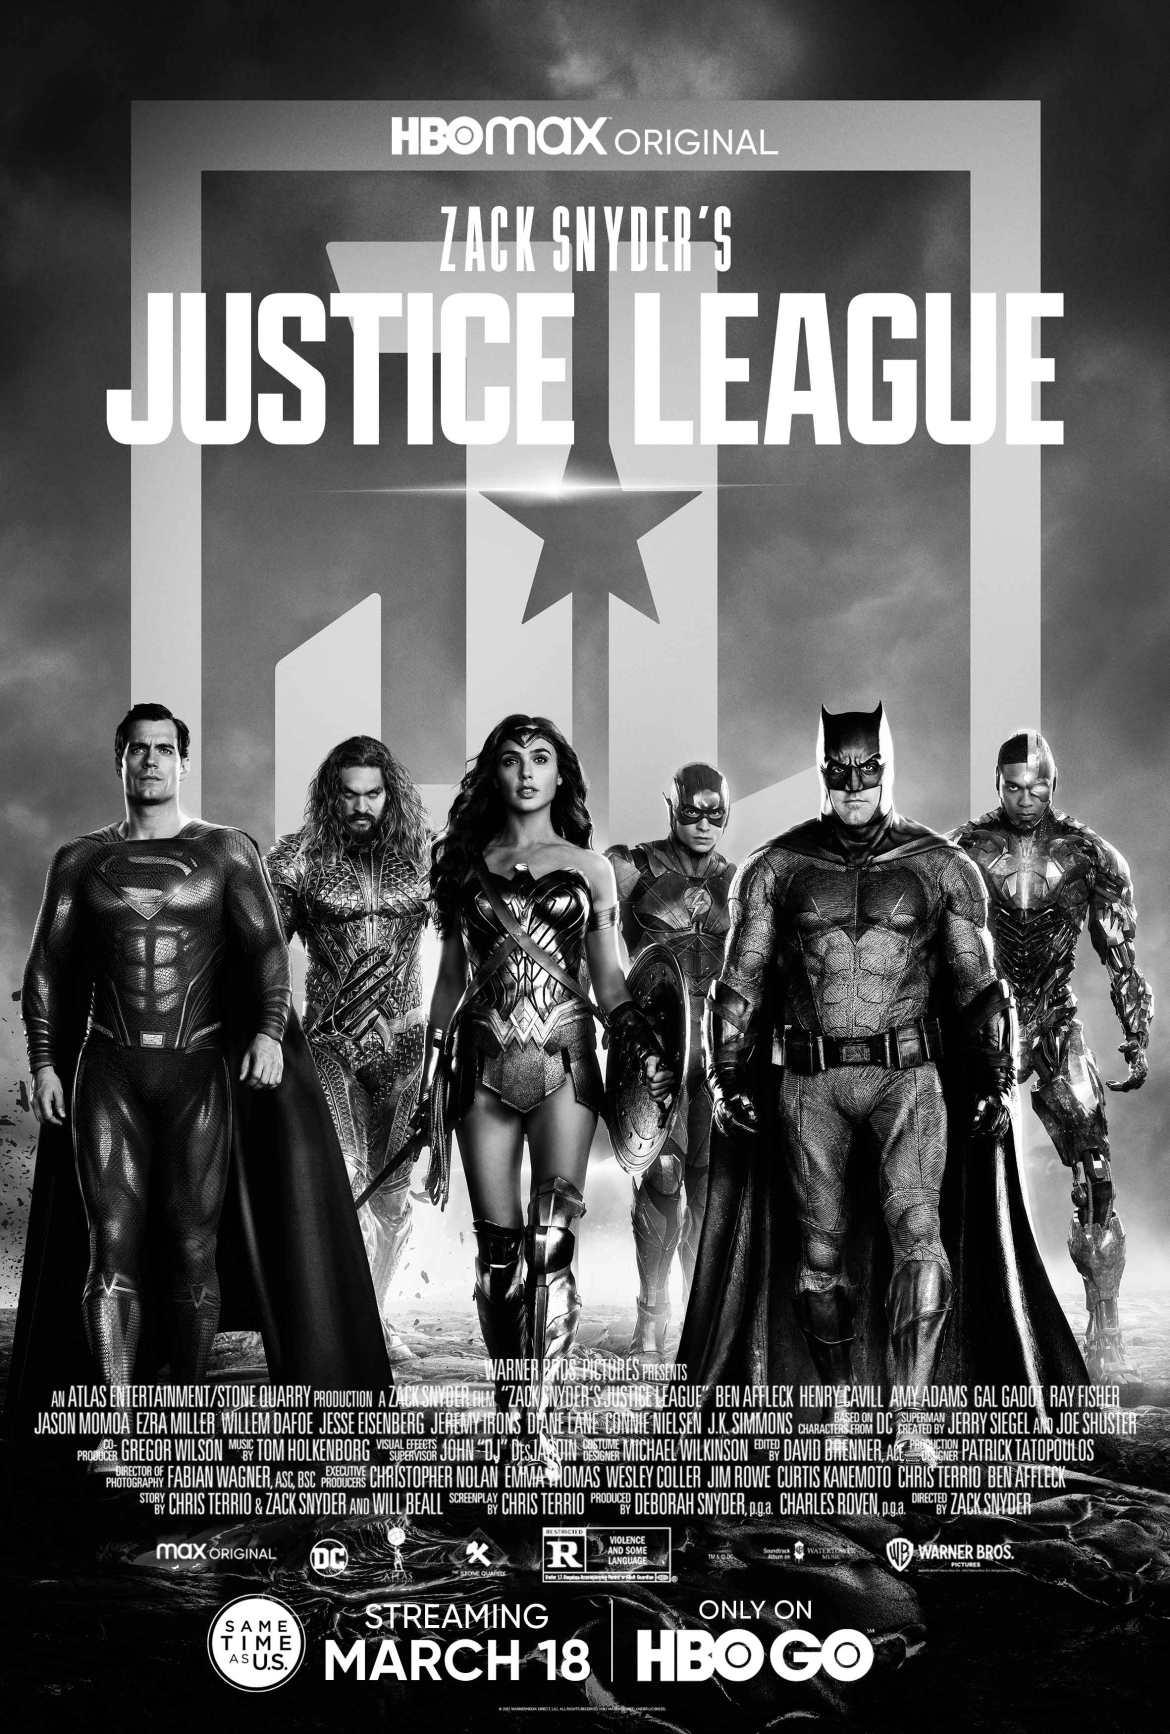 Xplode LIAO_justice league_正义联盟_复仇者联盟_Avengers